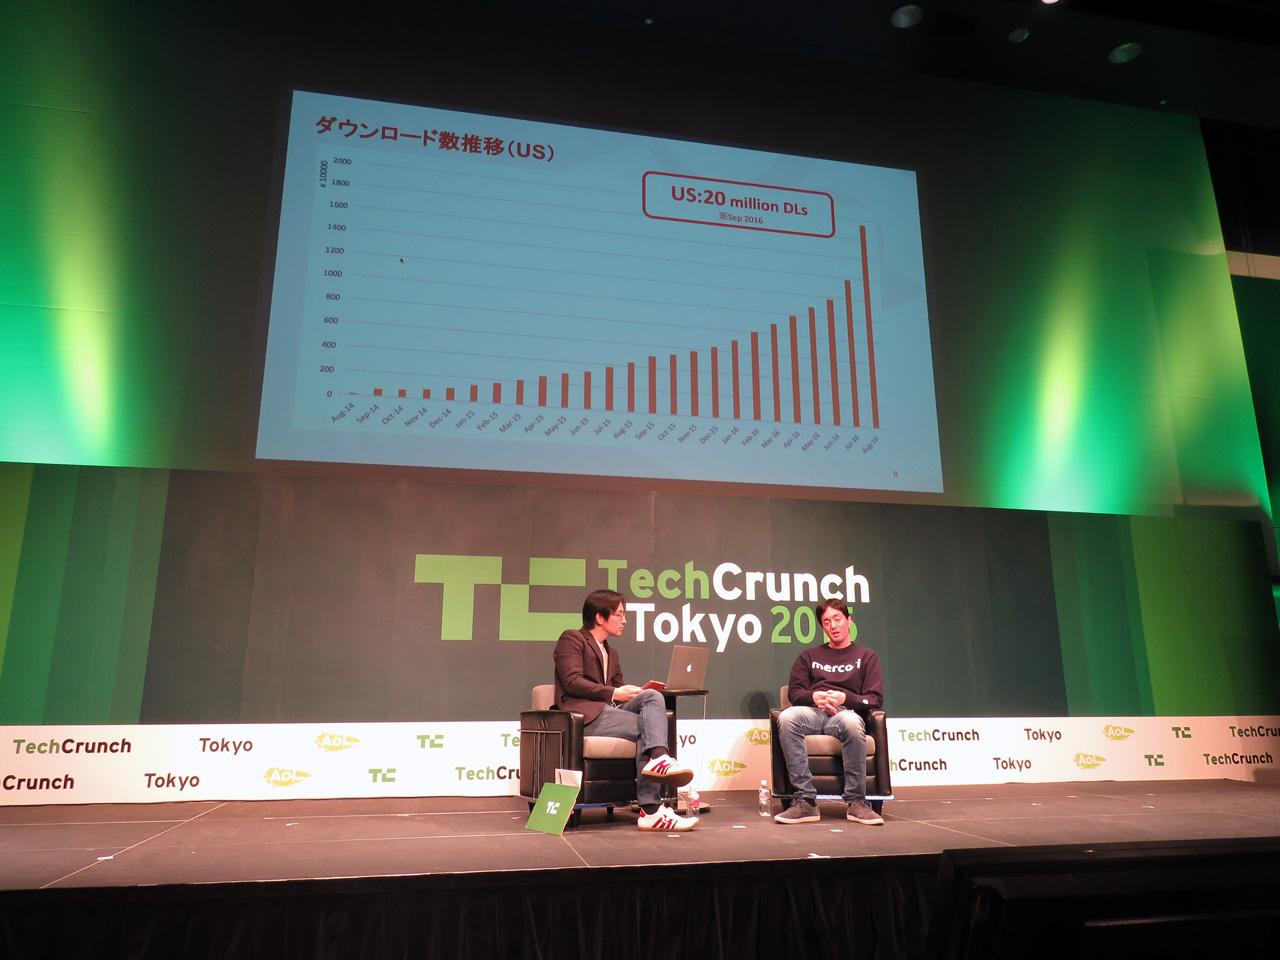 techcrunch-tokyo-2016-mercari